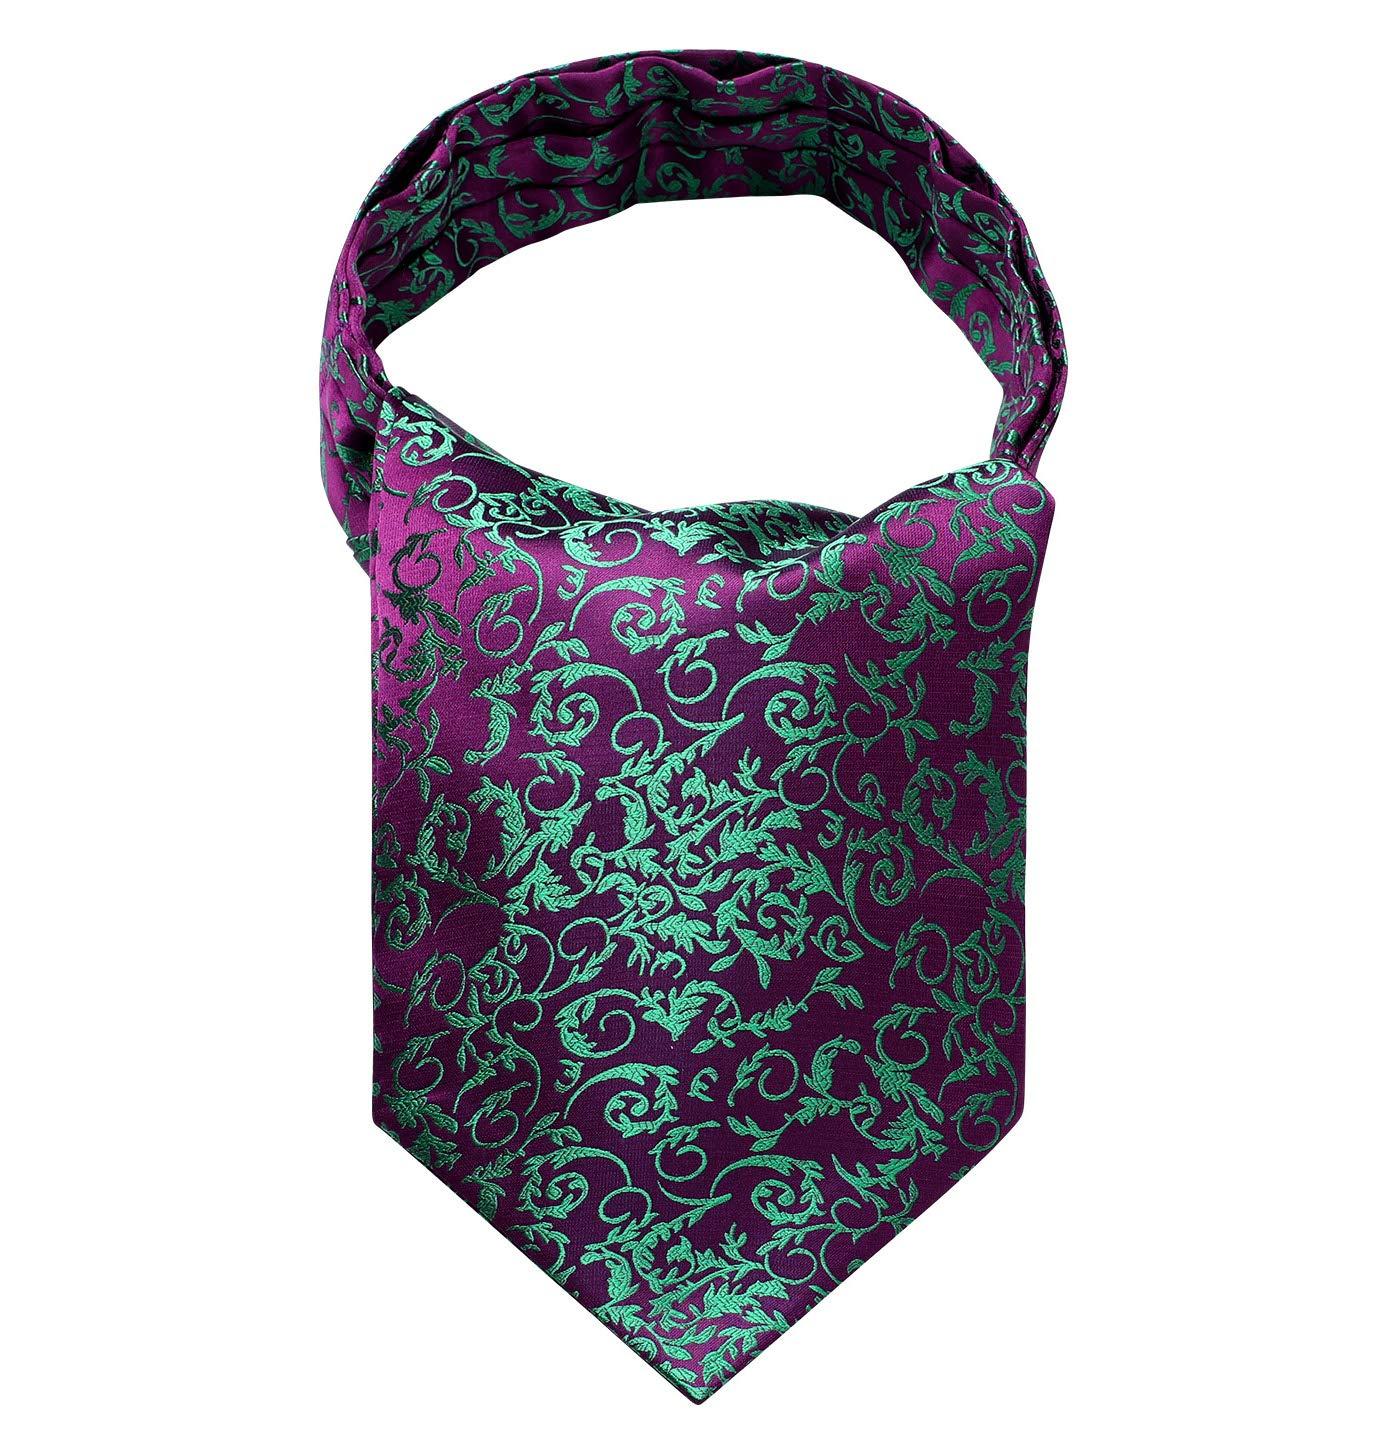 HISDERN Mens Floral Jacquard Woven Self Cravat Tie Ascot